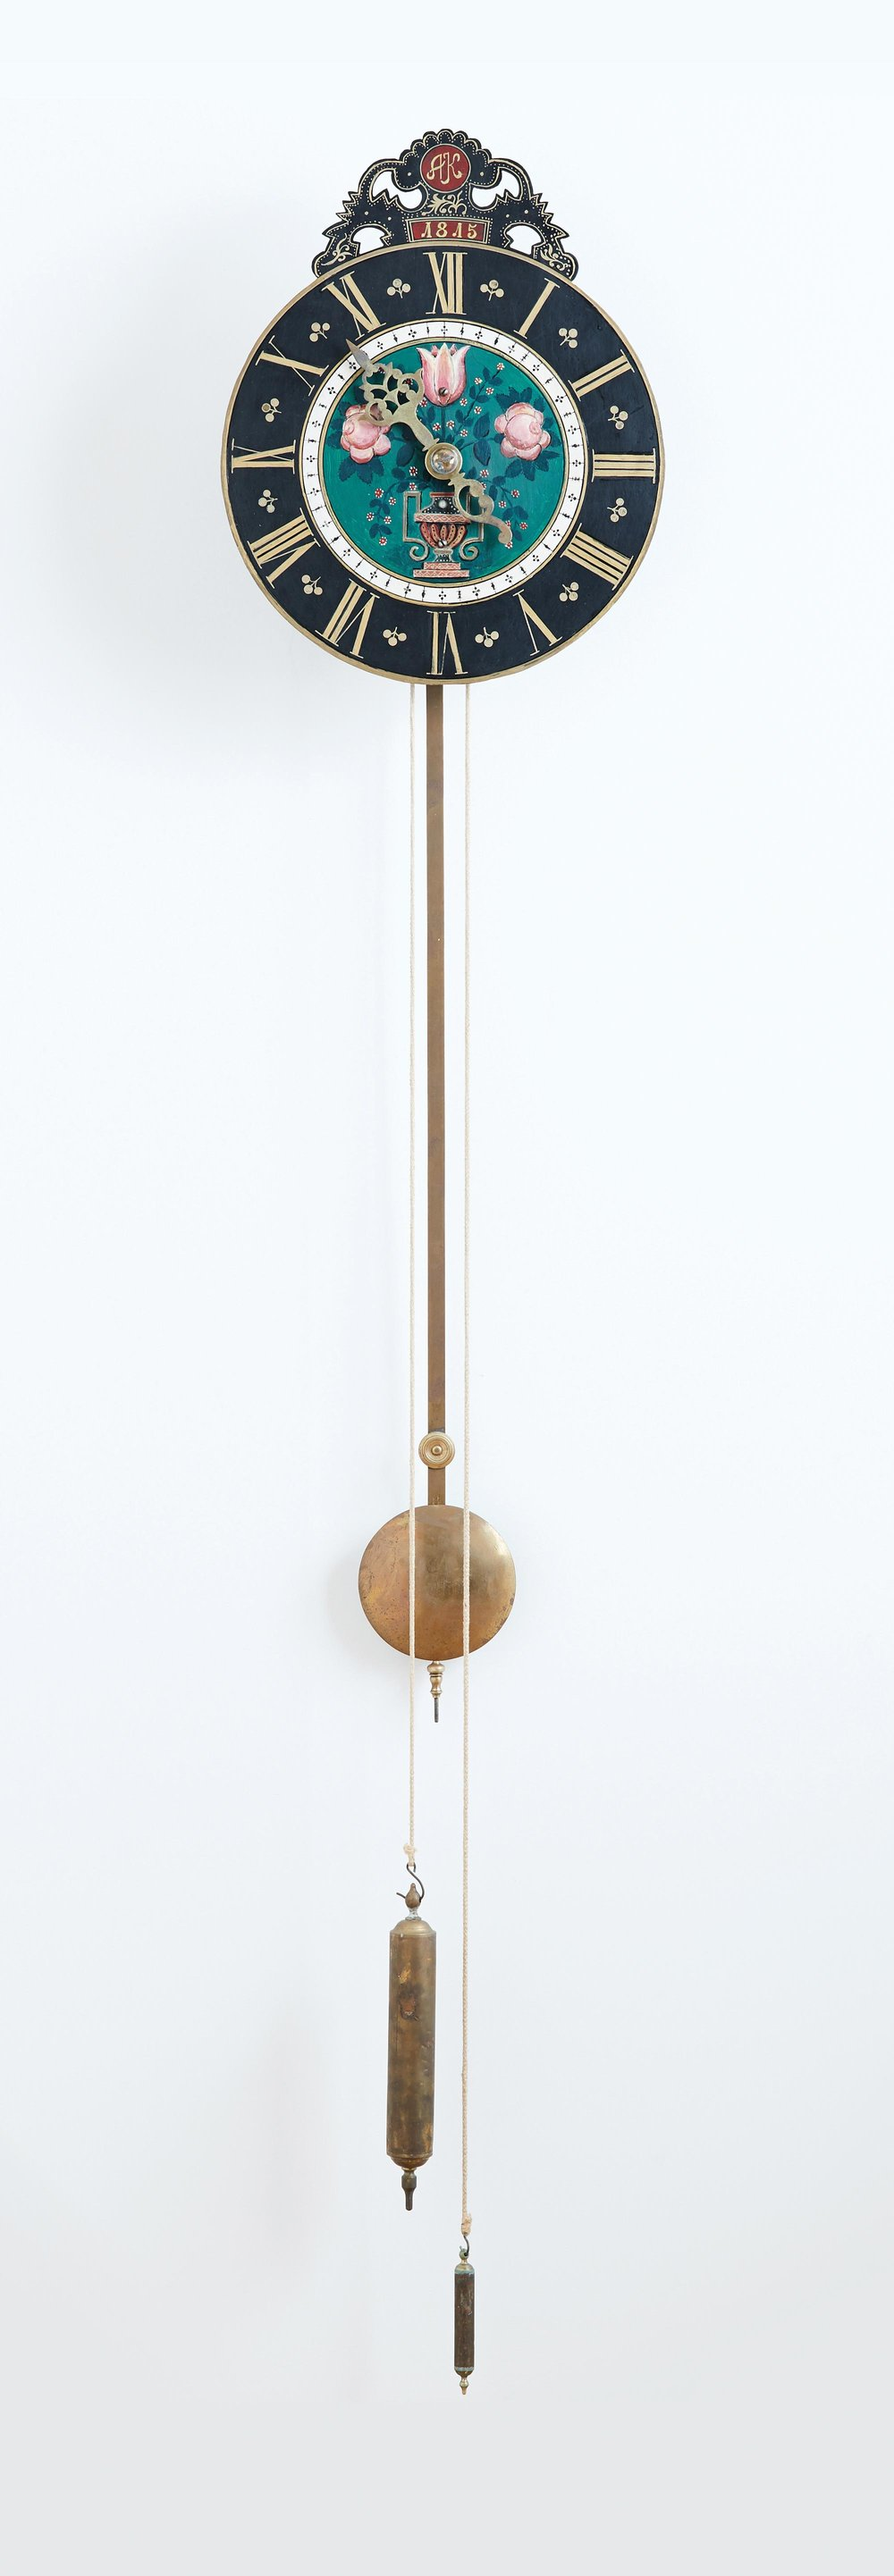 werder-clock-mennonite-kreoger-mc0008-1.jpg